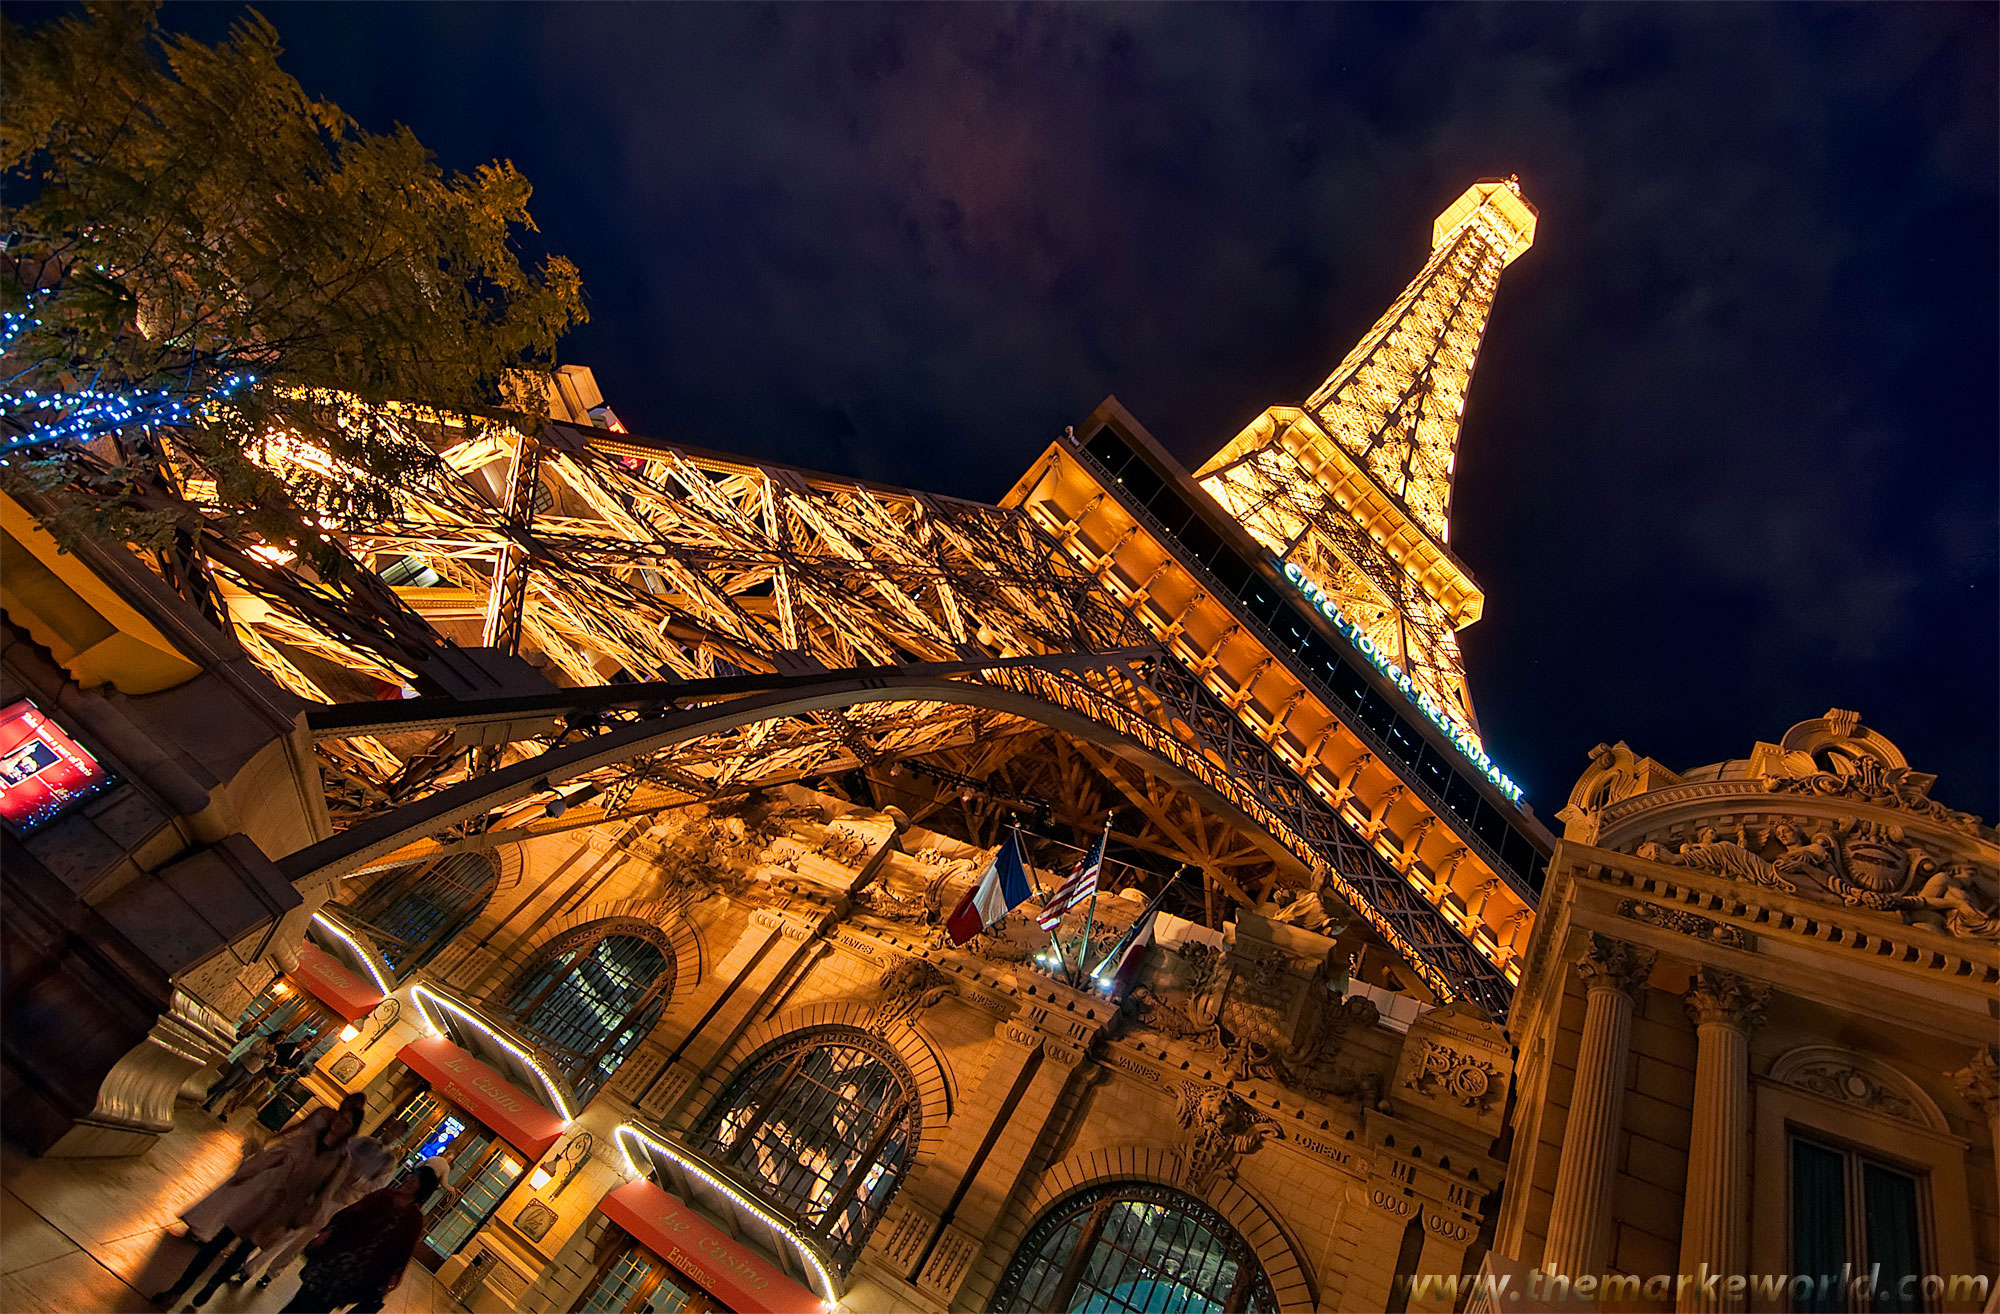 Eiffel Tower Restaurant at Eiffel Tower